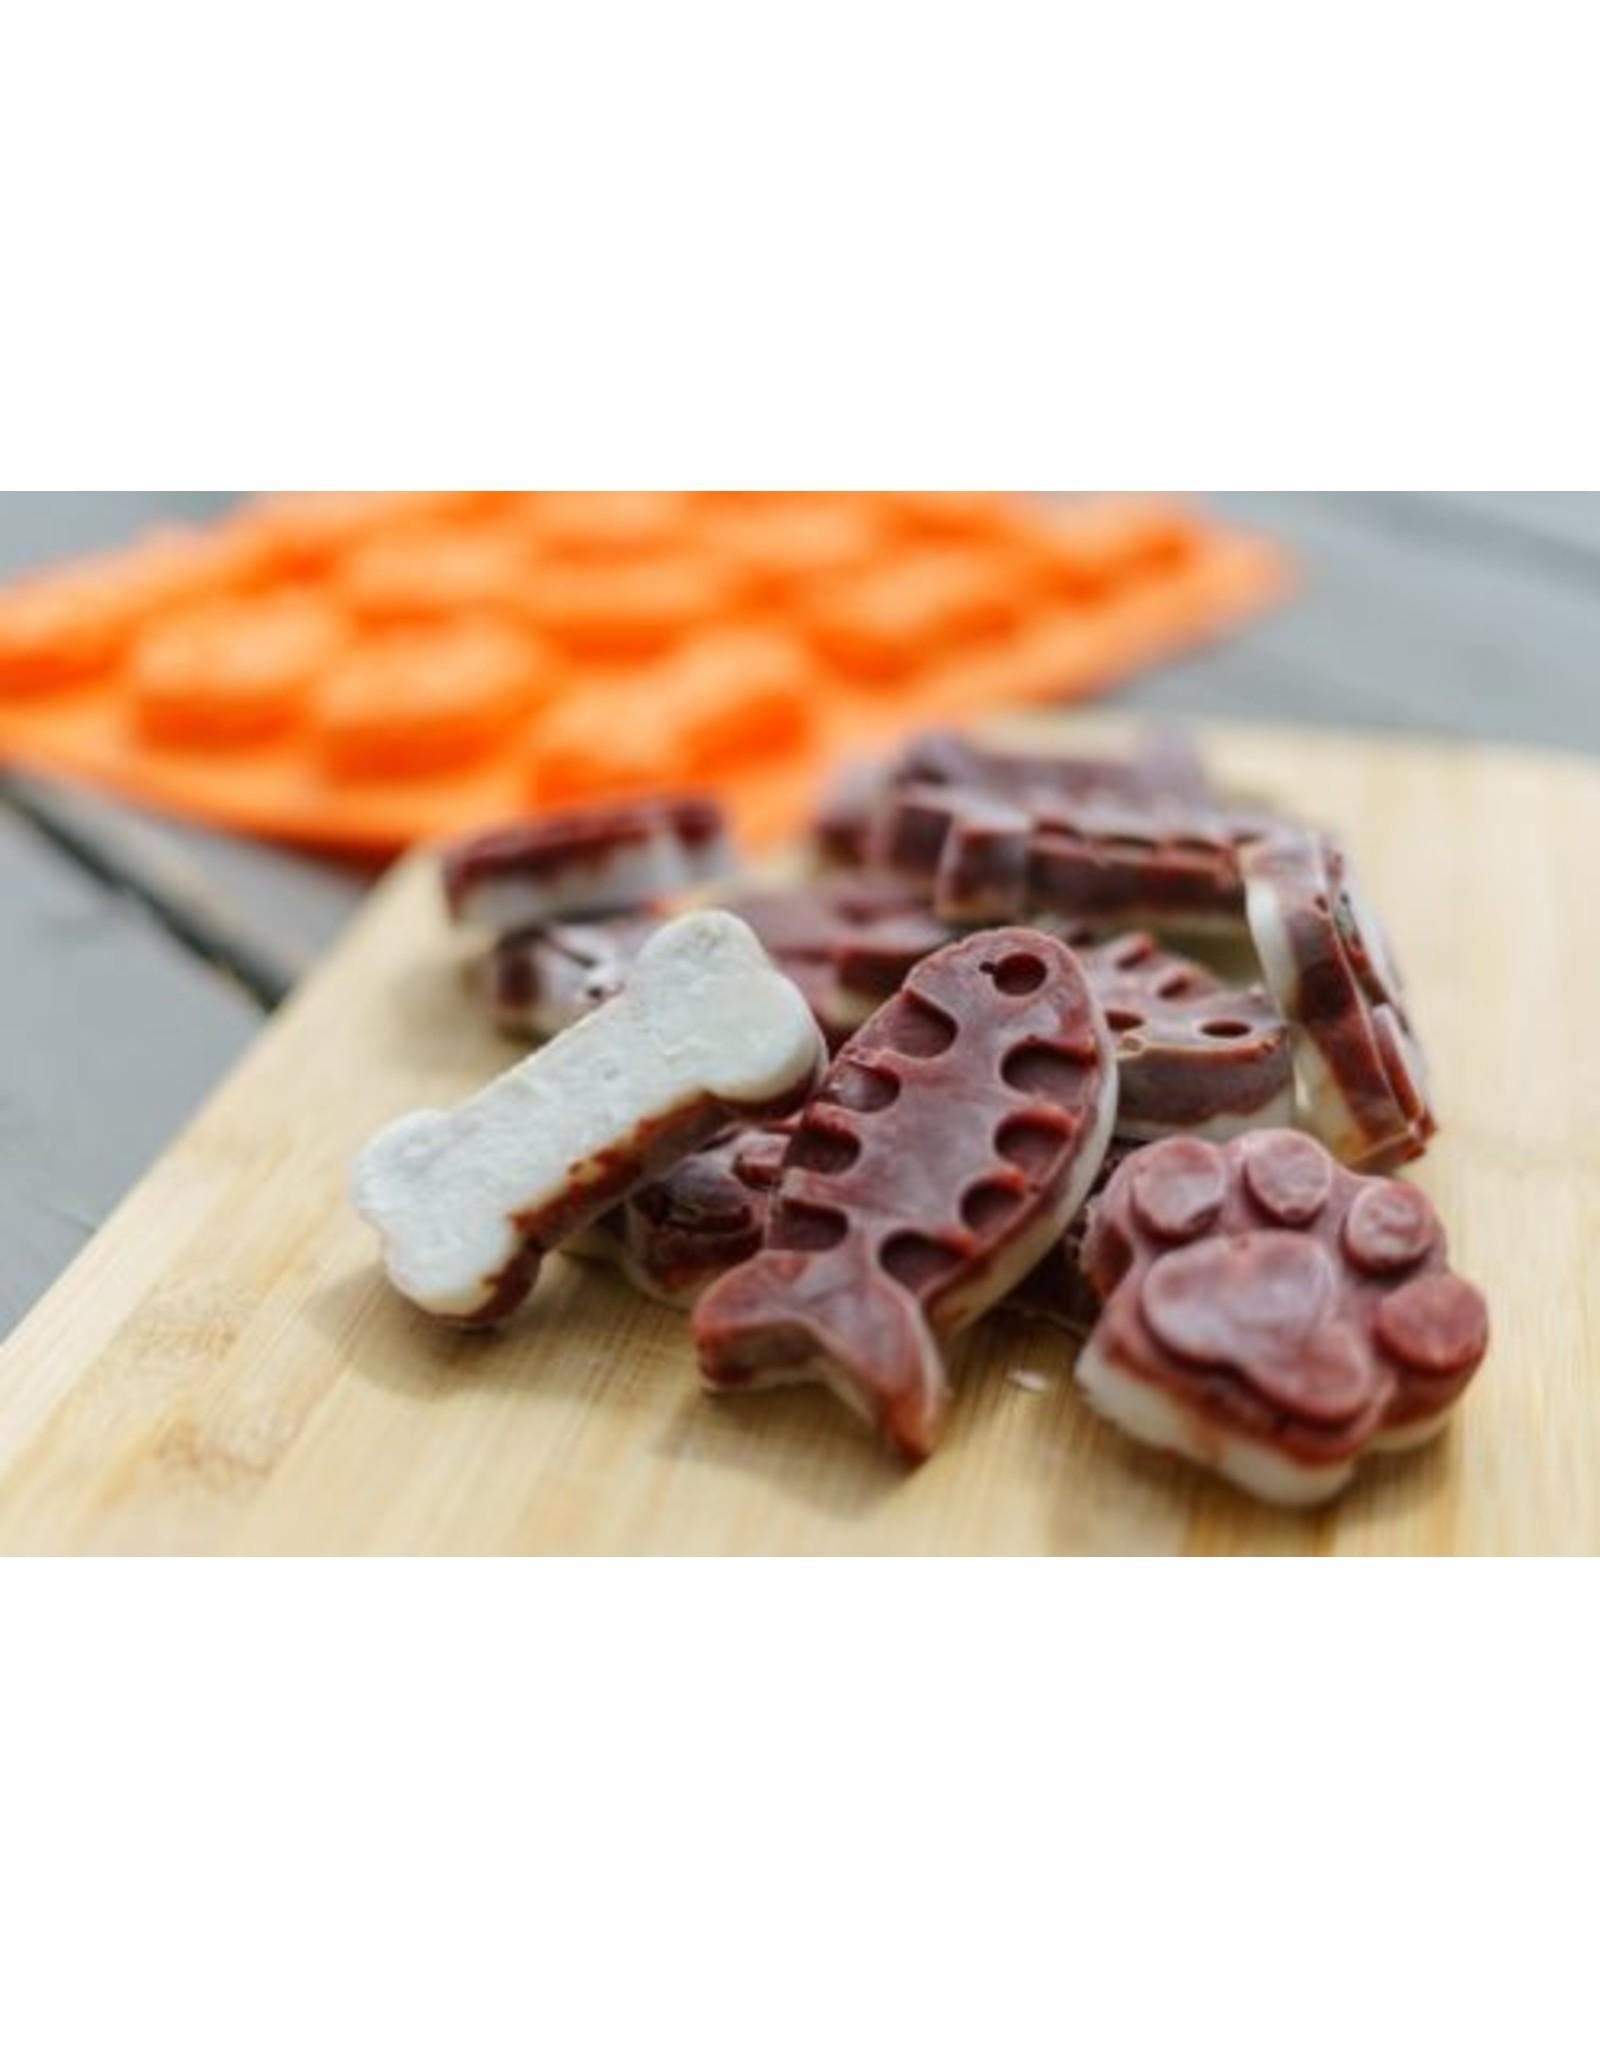 Big Country Raw Treat Mold - Fish, Paw & Bone Shape